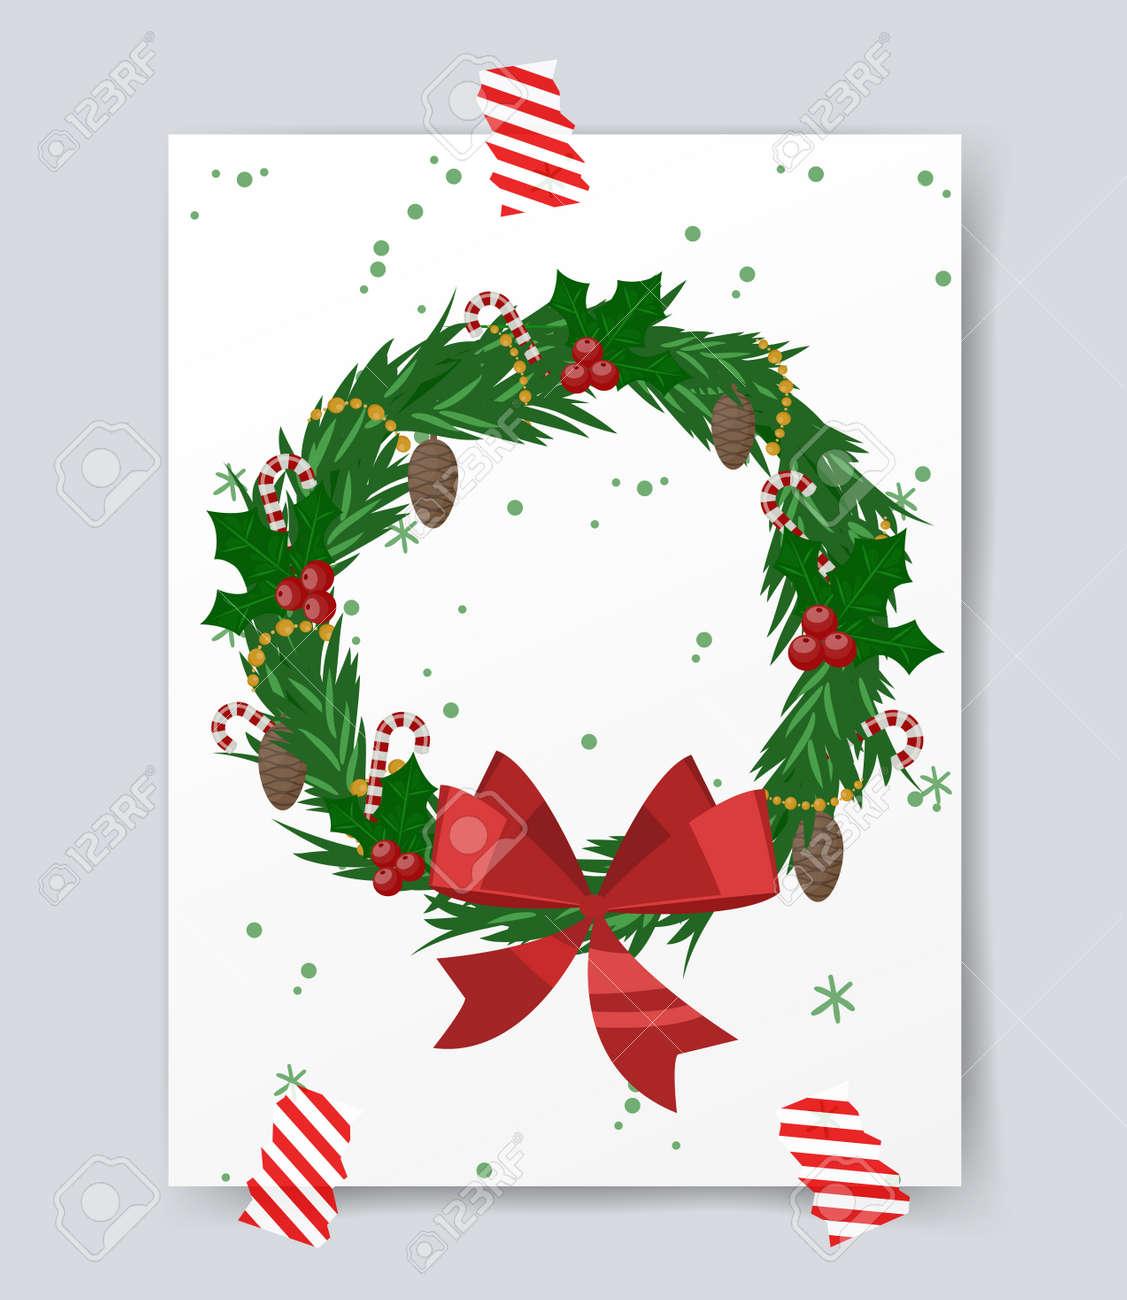 Christmas Greeting Cards Collection Christmas Greeting Card